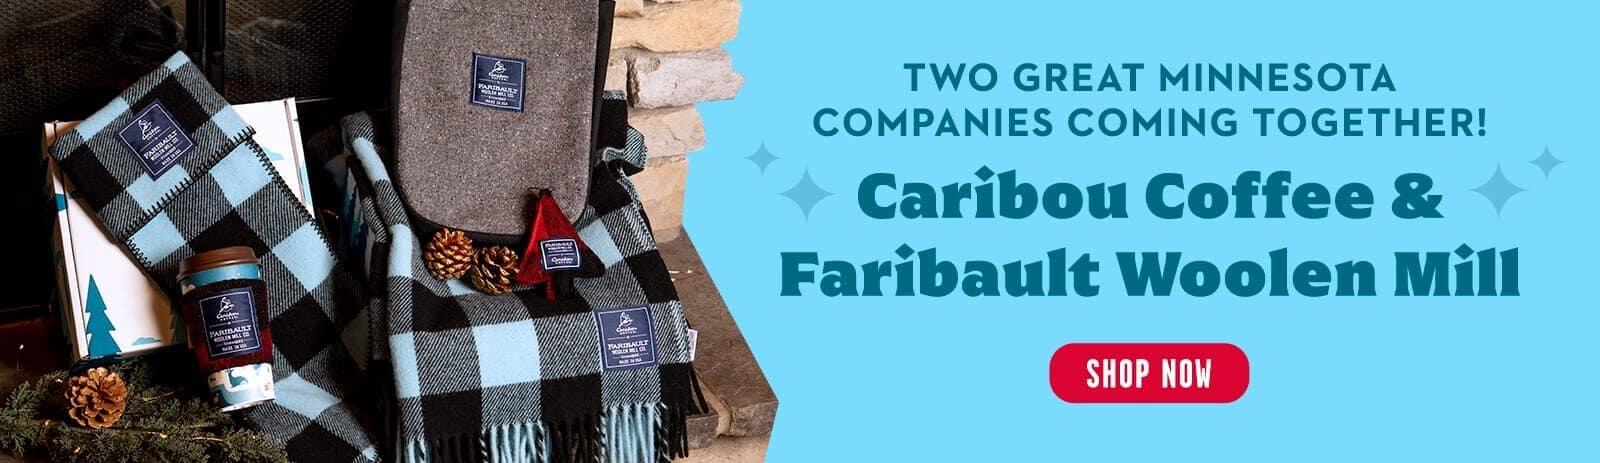 Faribault Woolen Mill Desktop Banner